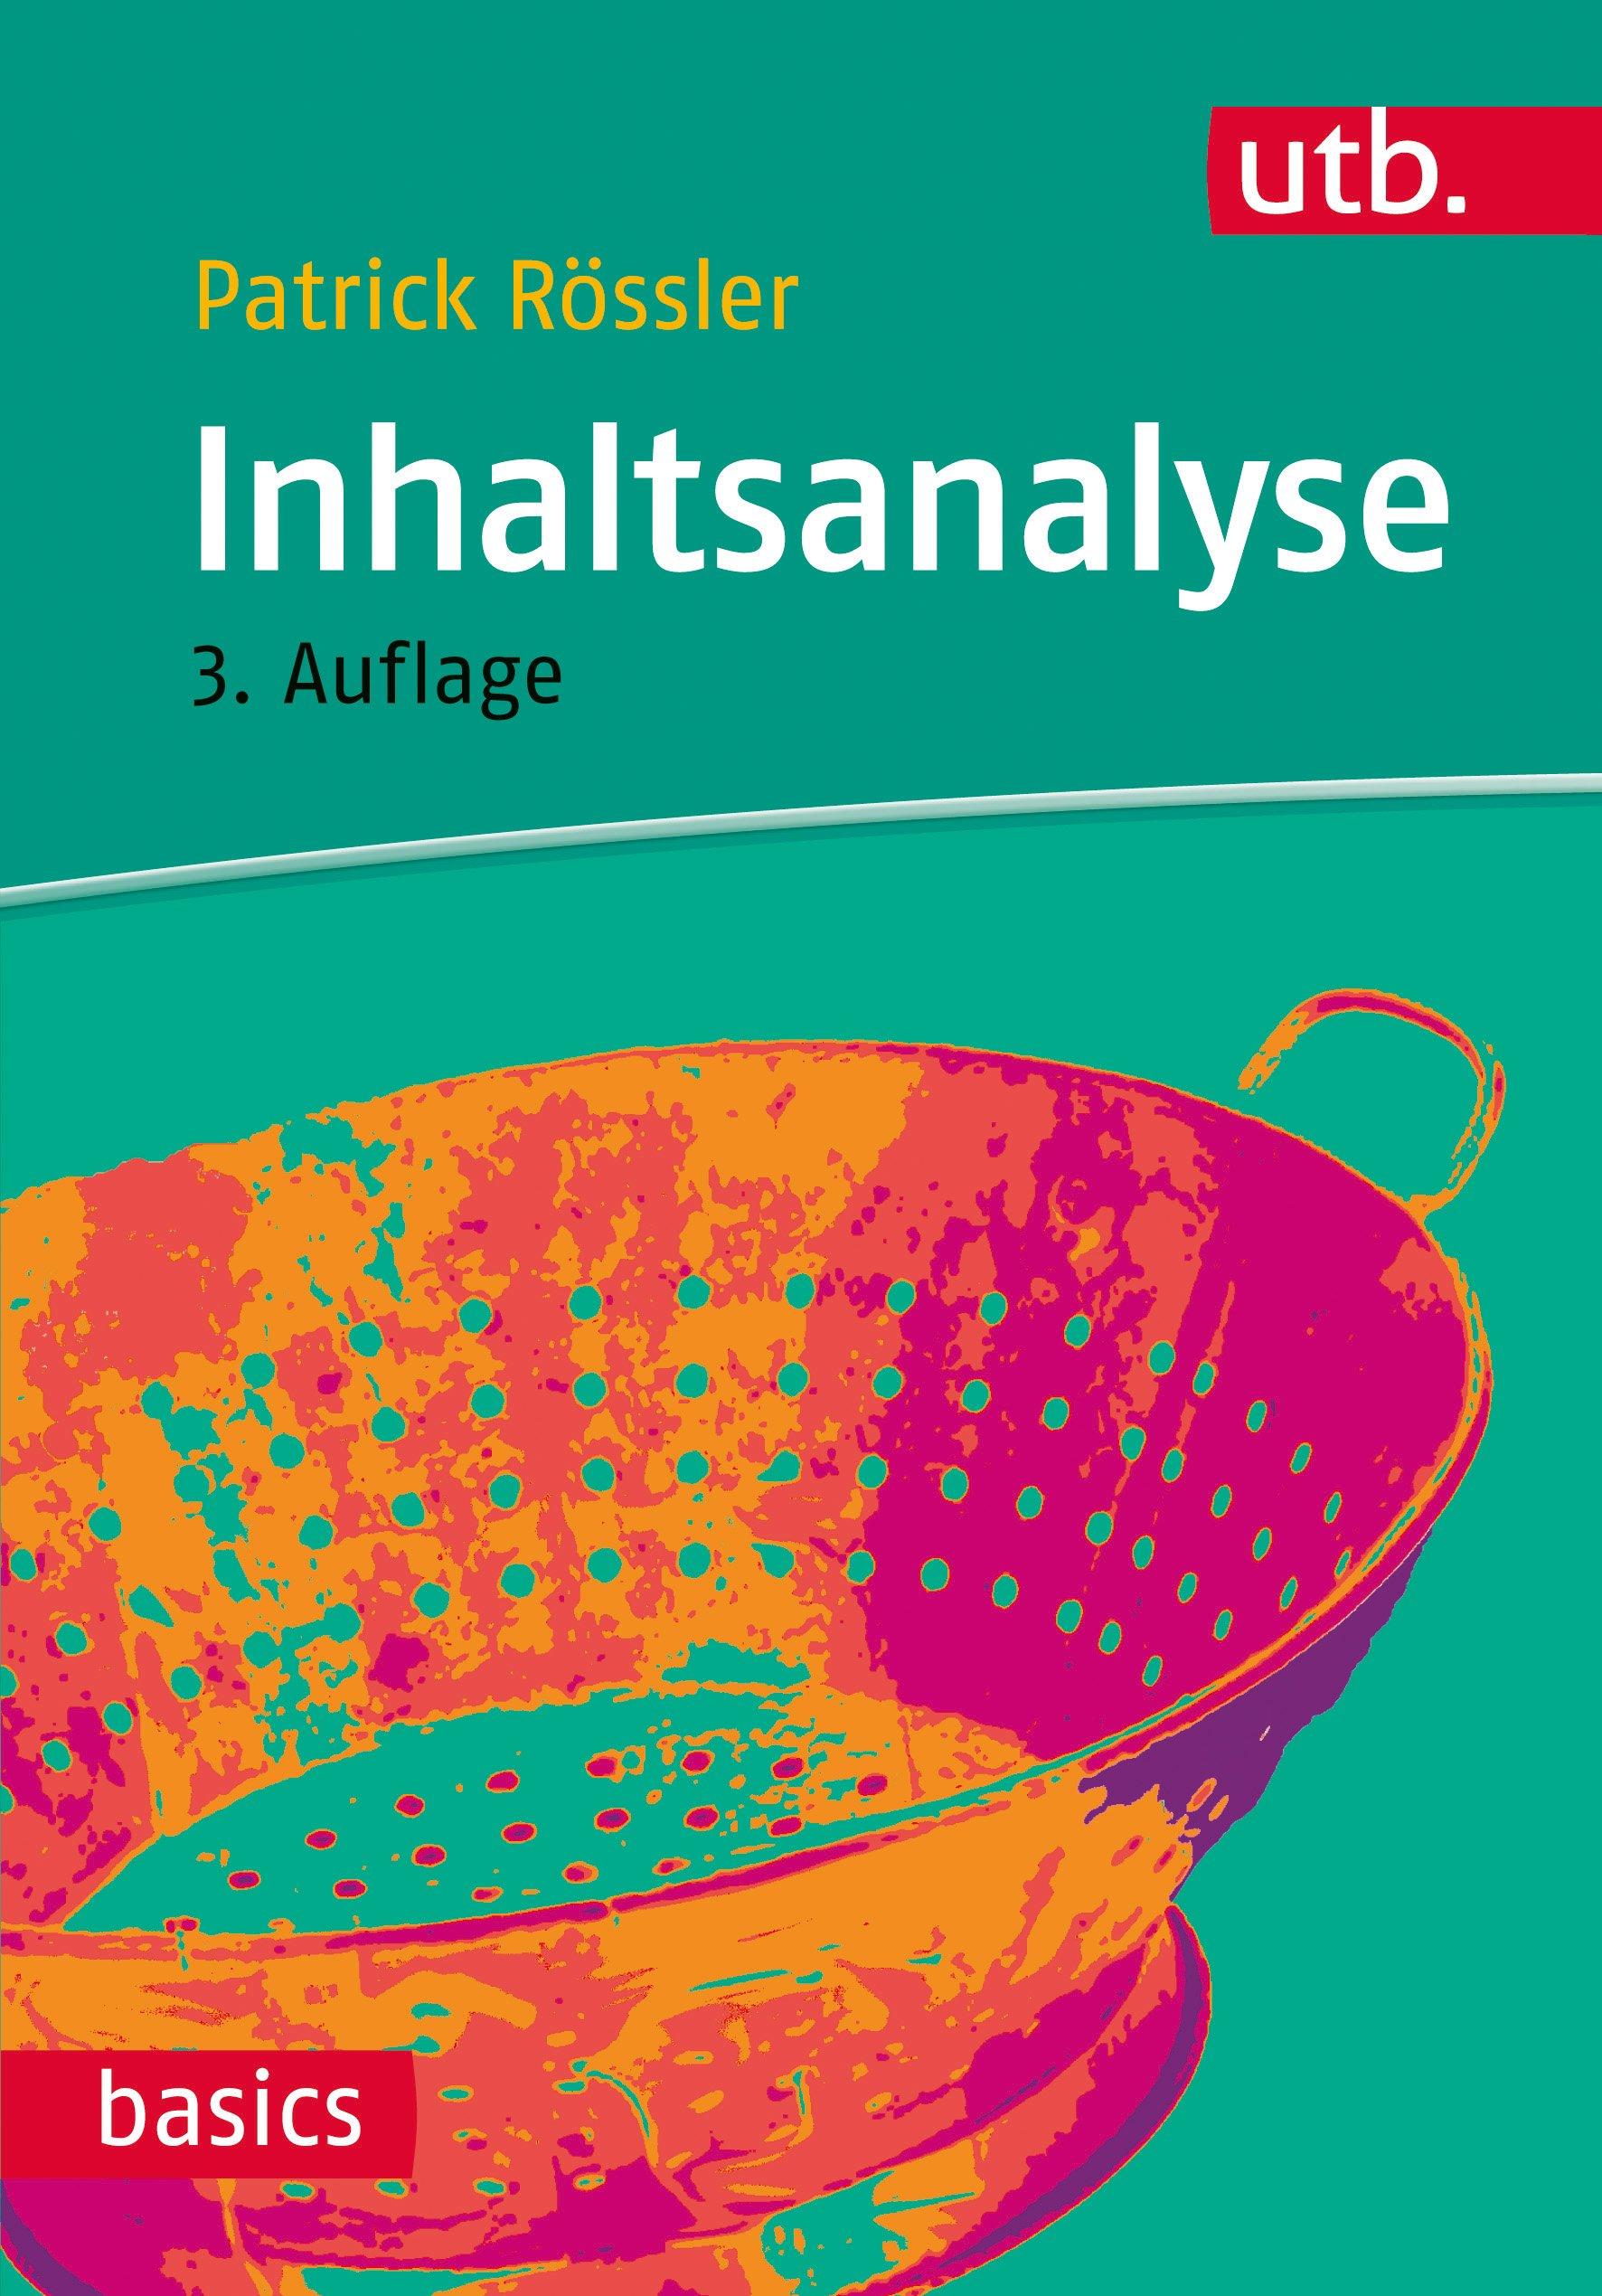 Inhaltsanalyse (utb basics, Band 2671): Amazon.de: Patrick Rössler ...